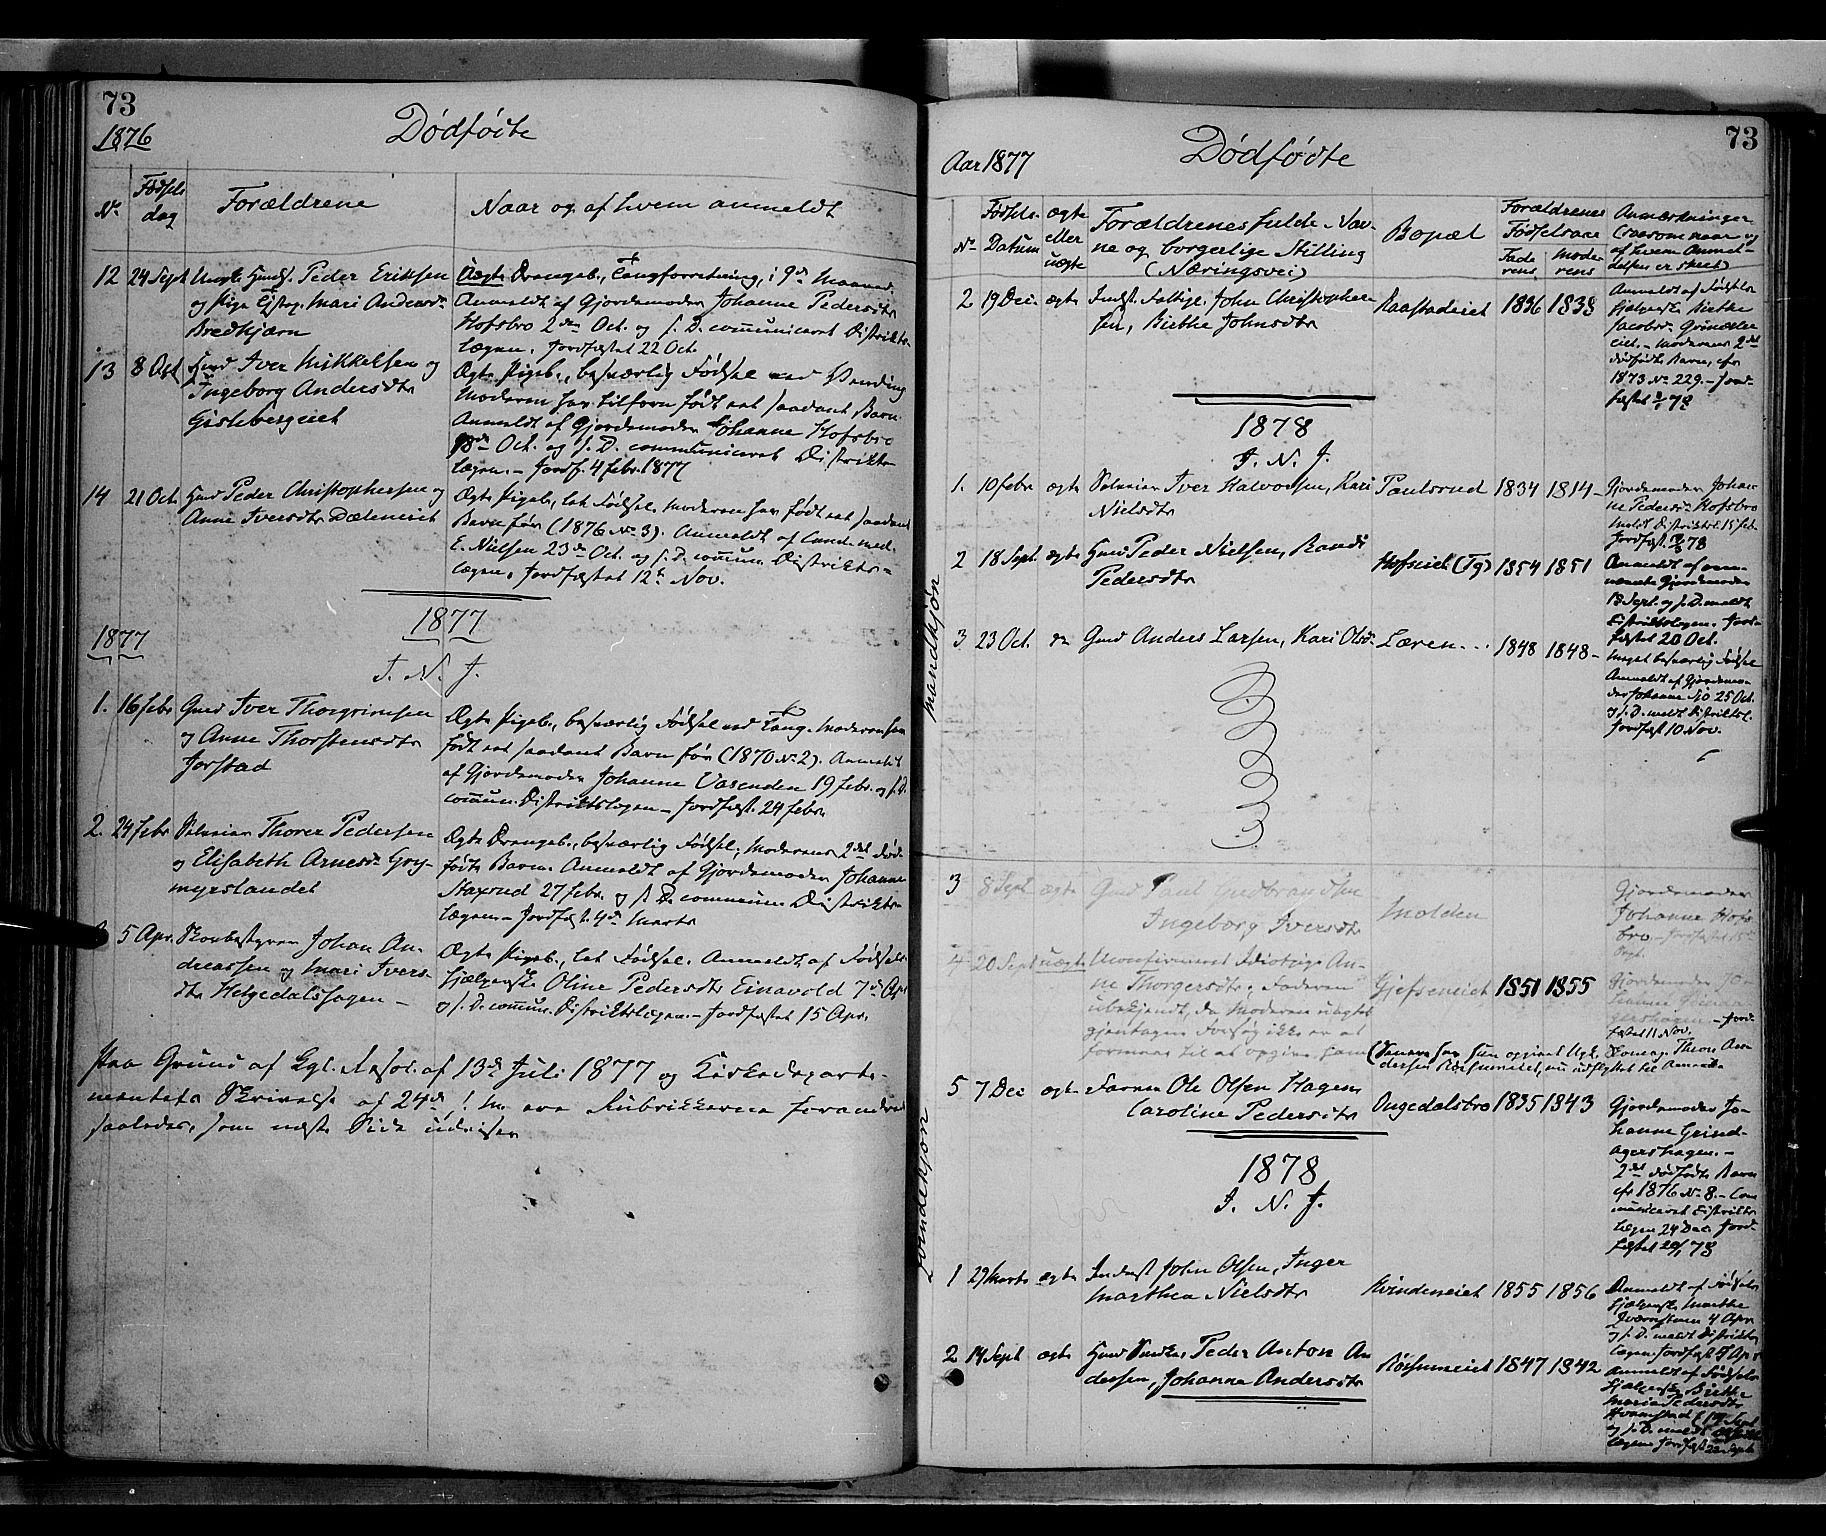 SAH, Gran prestekontor, Ministerialbok nr. 13, 1875-1879, s. 73